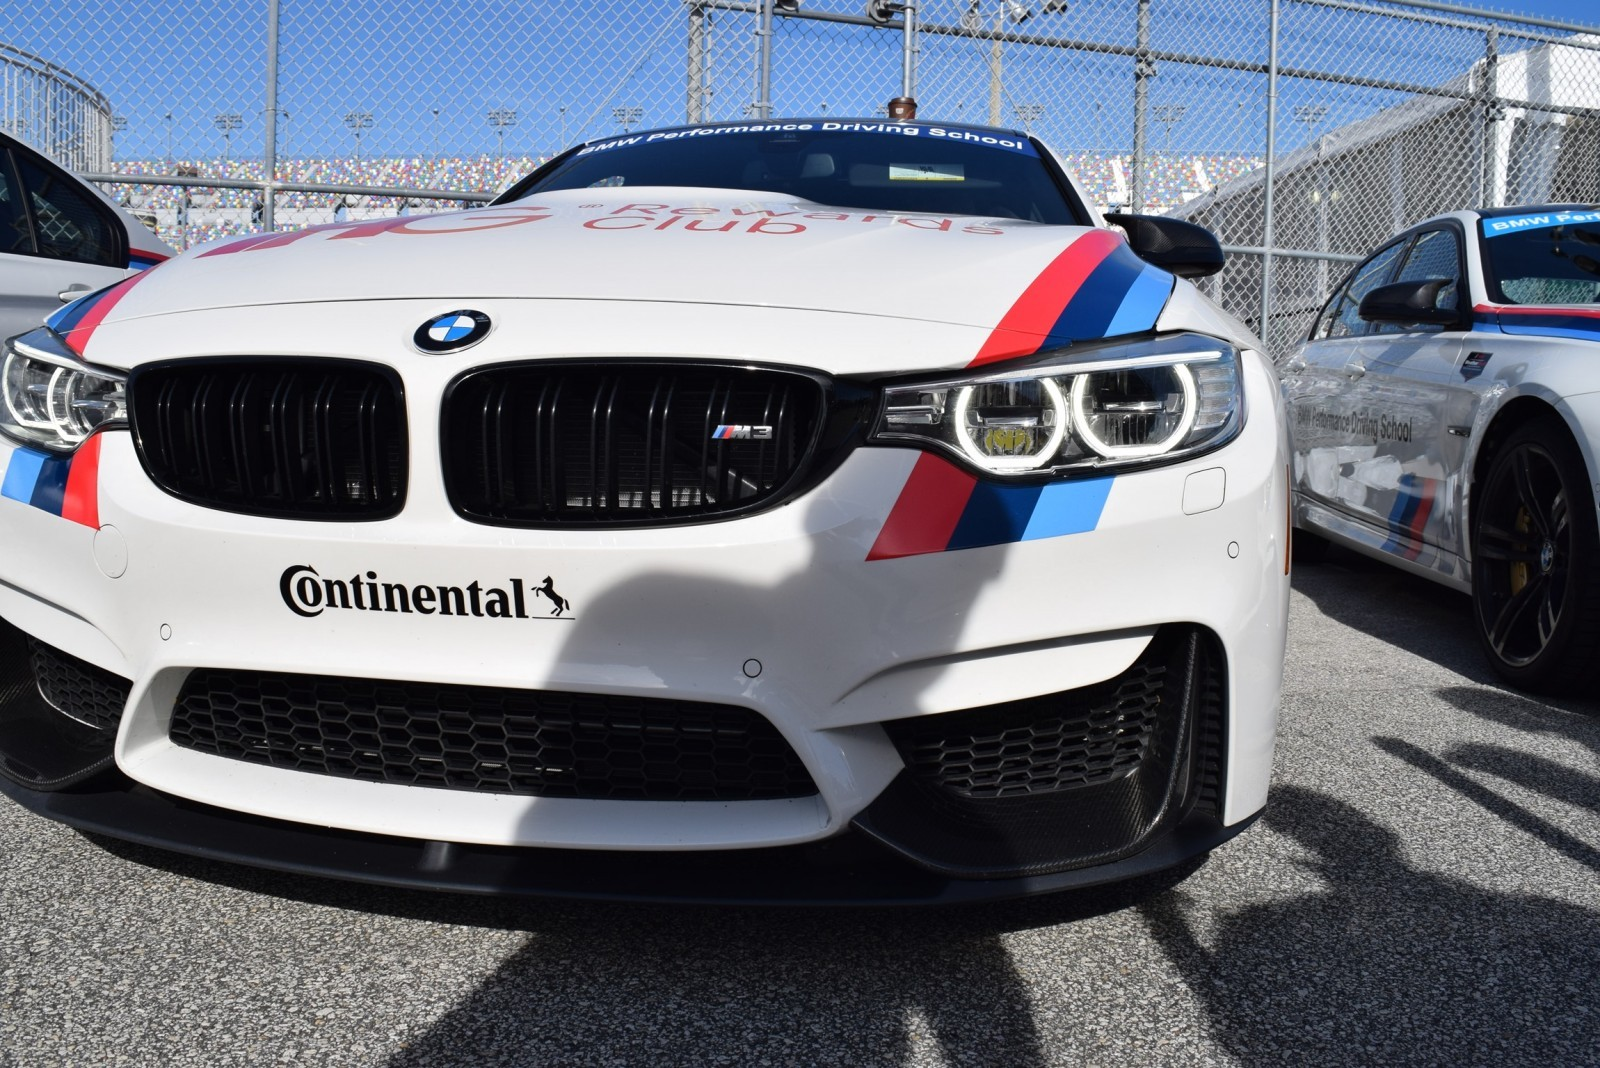 2016 Bmw M3 M Livery Photos From Daytona Speedway Bmw Performance Driving School 187 Car Revs